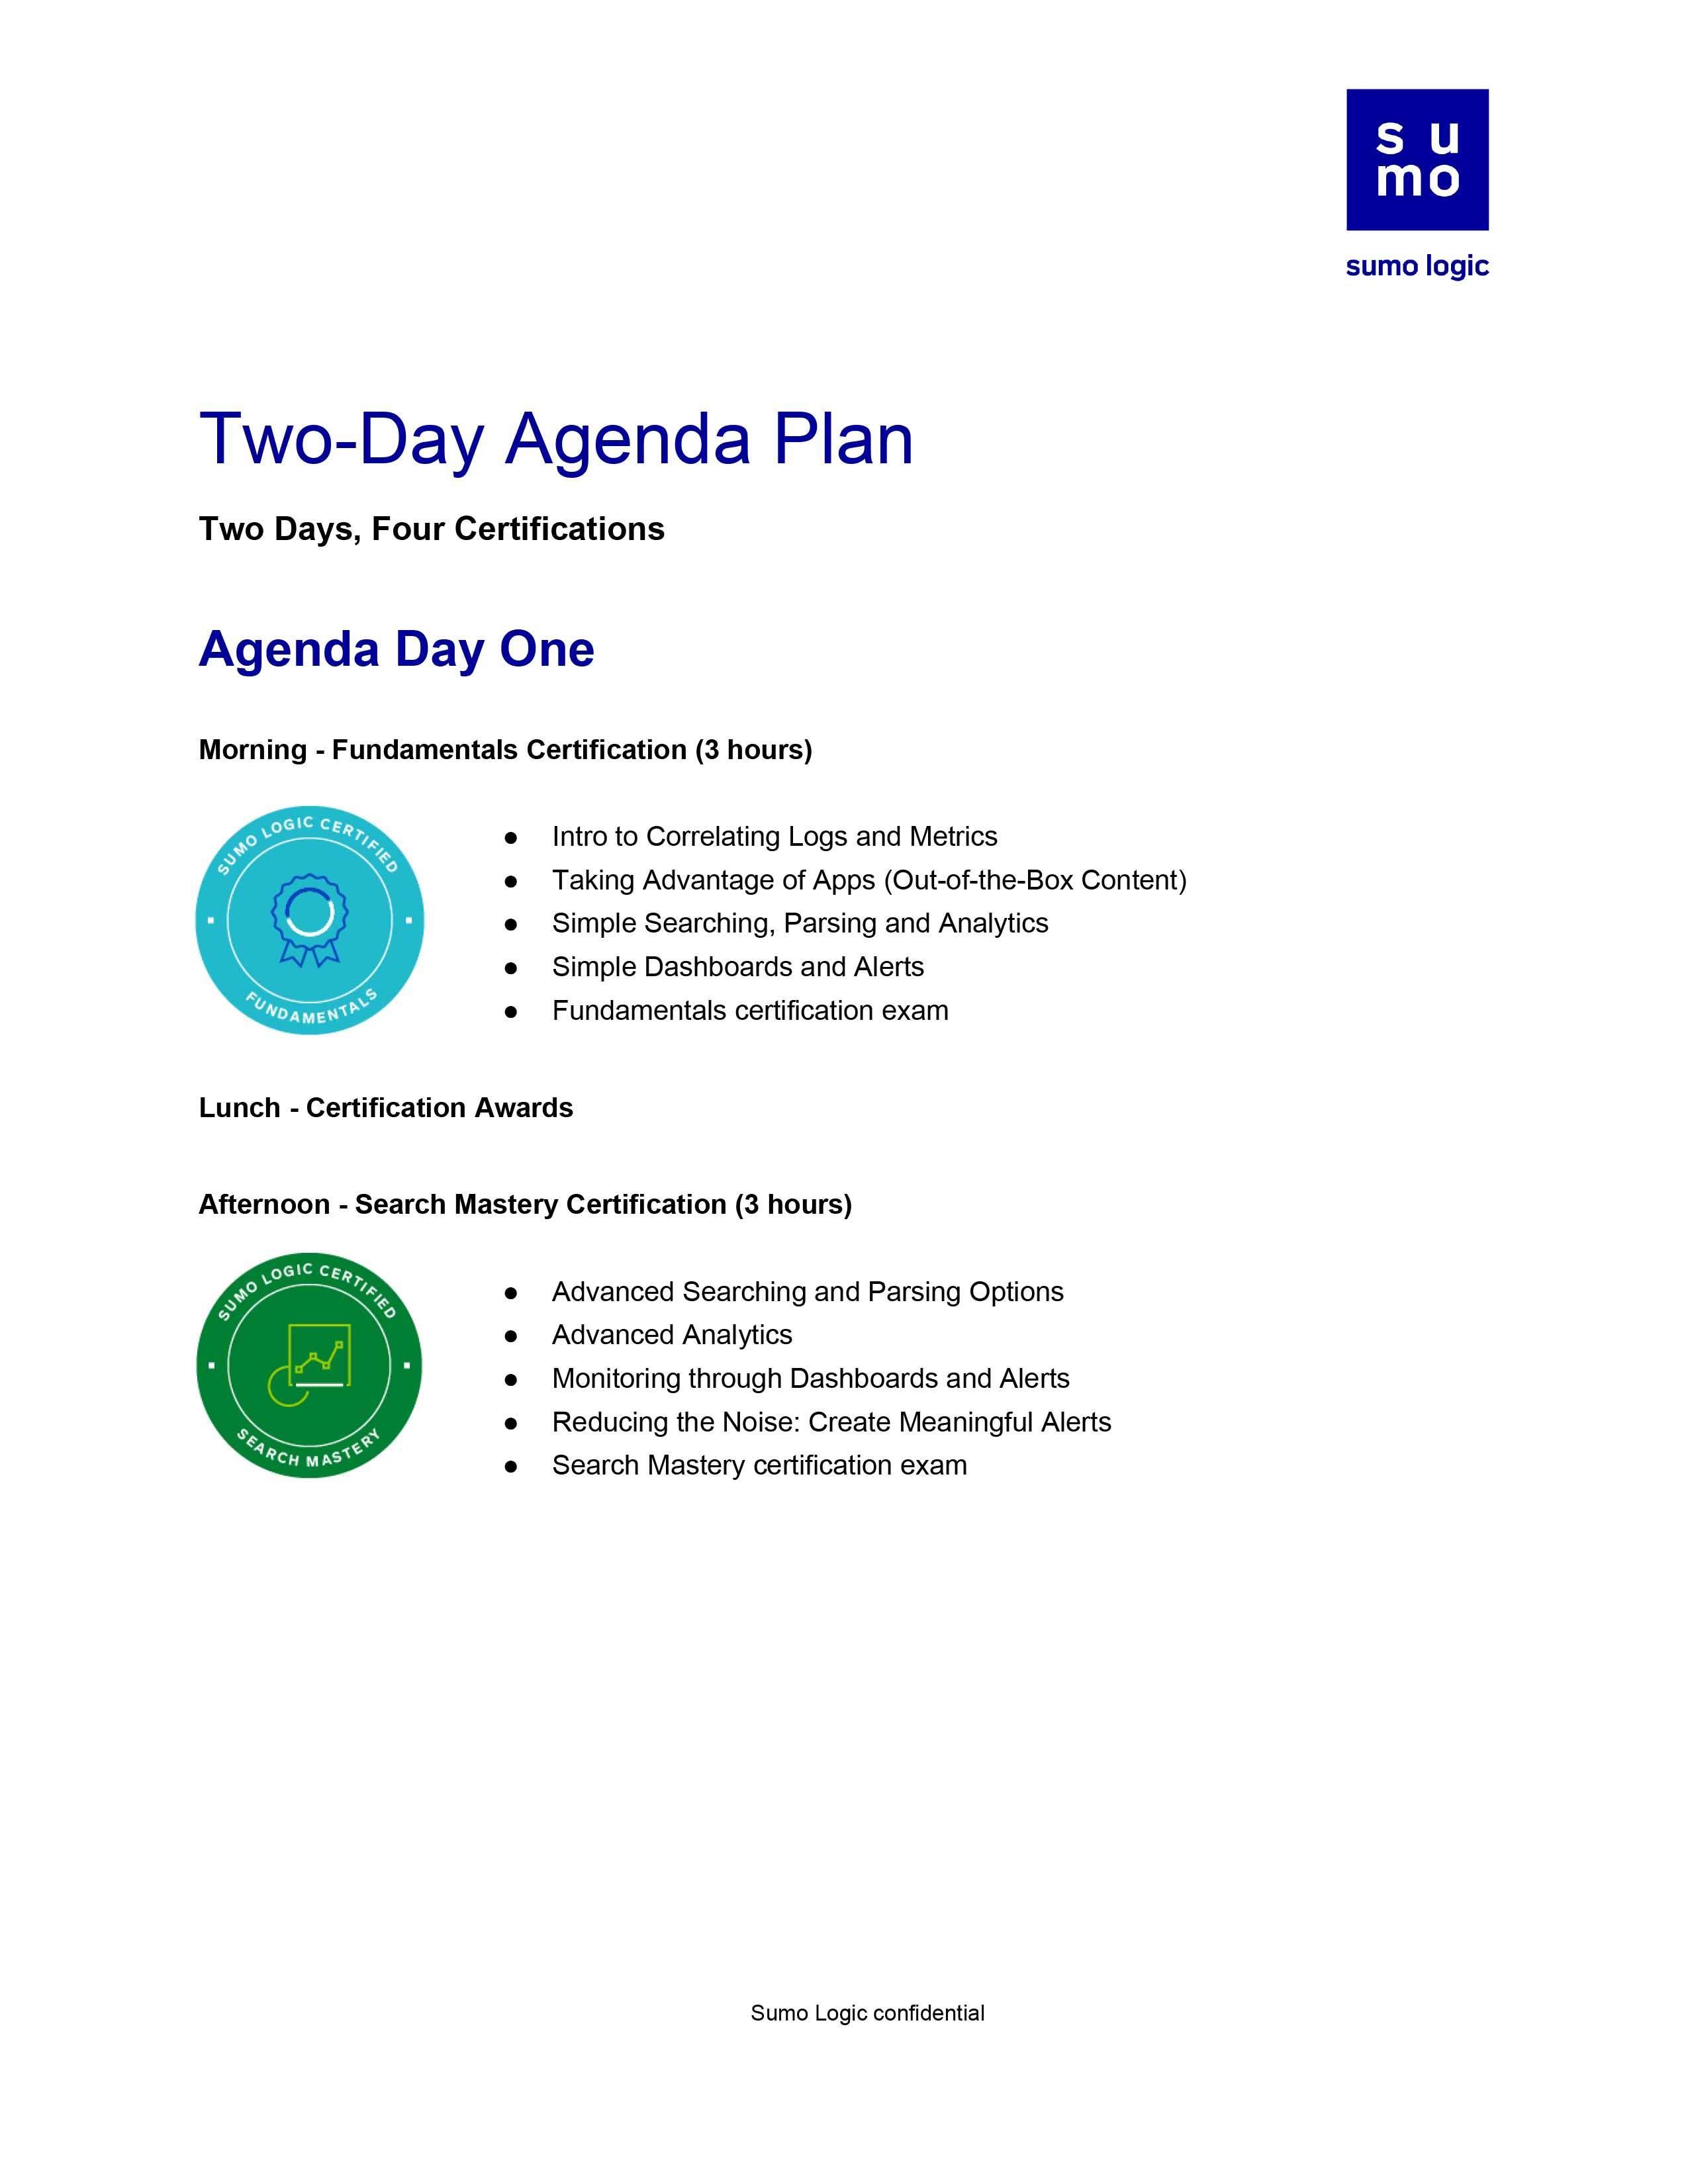 On-site Certifications Agenda